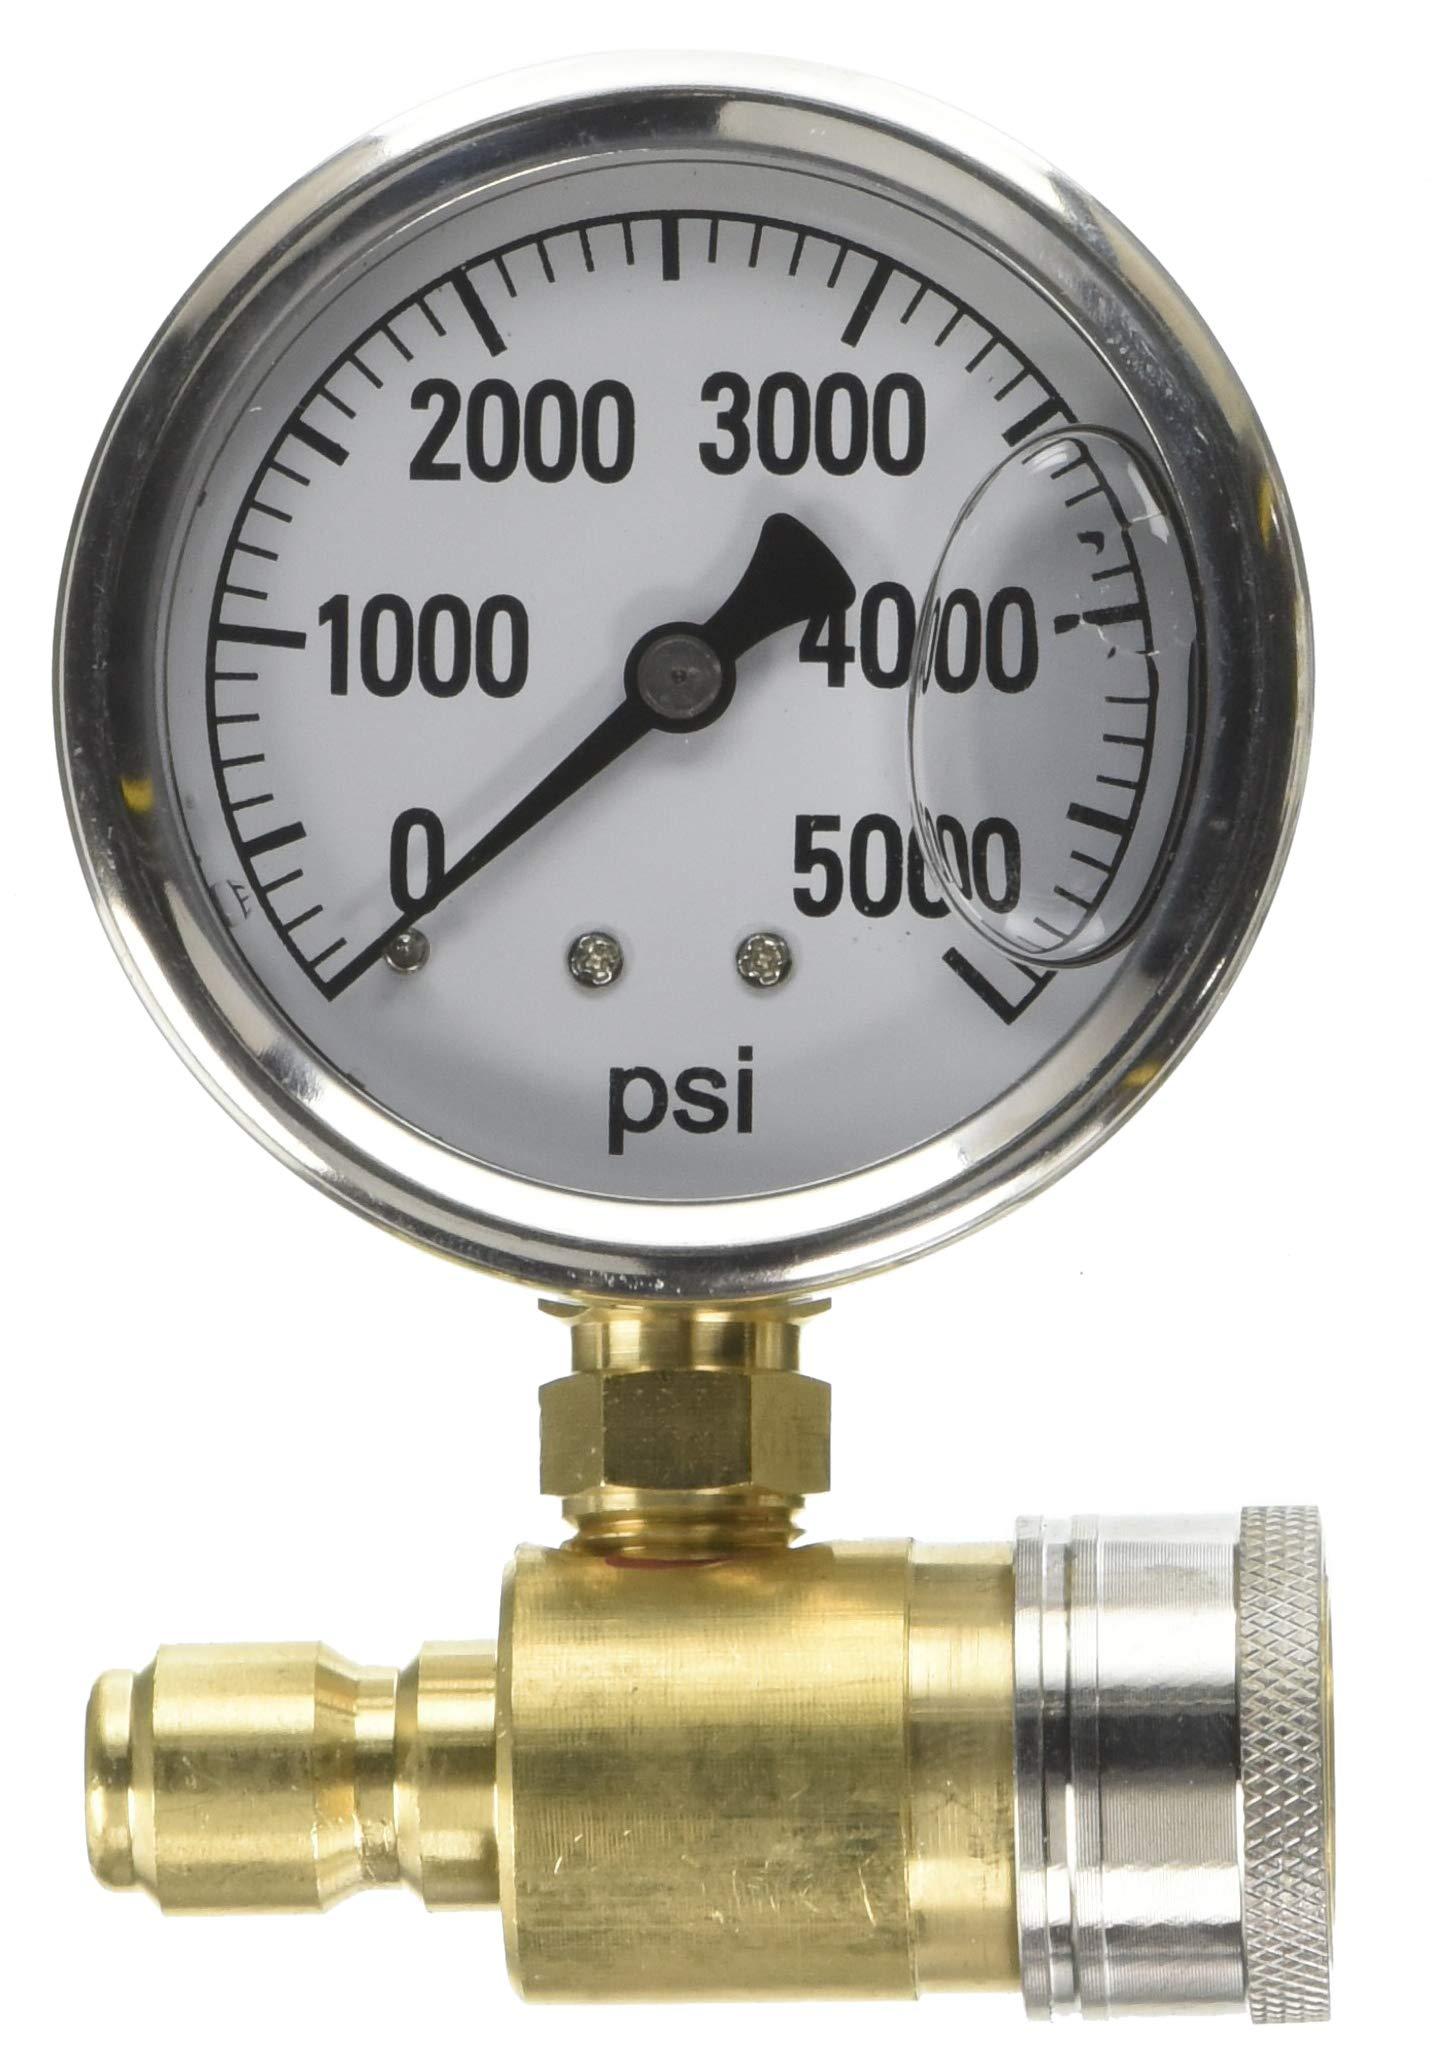 Valley Industries PK-QCG-5000 Pressure Washer Gauge, Brown by Valley Industries (Image #1)